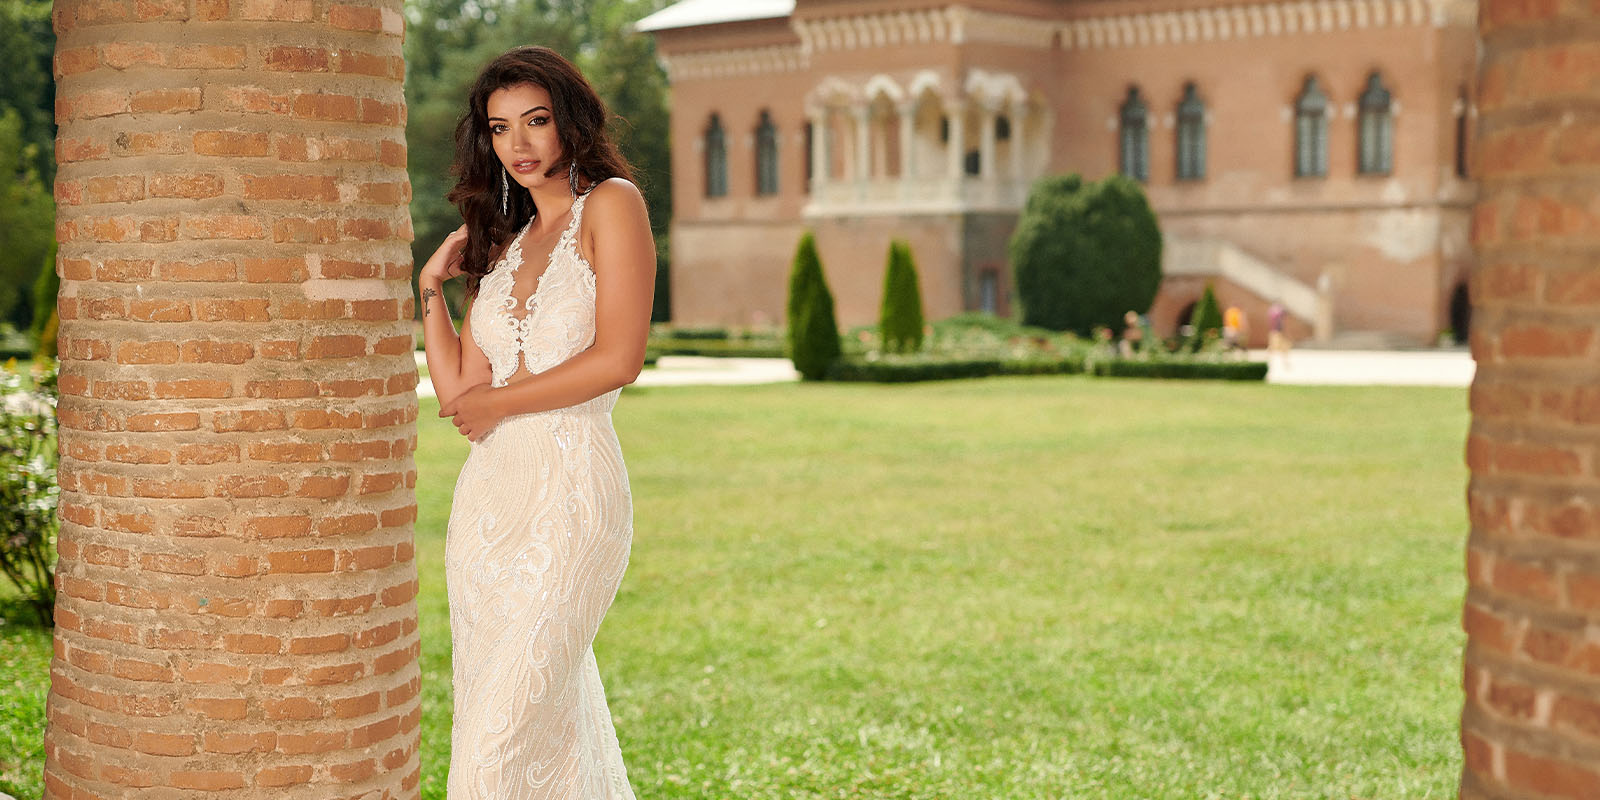 Acasa - rochii de mireasa - Rochii de Mireasa Adora Sposa | Atelier rochii de mireasa | Showroom Bucuresti -